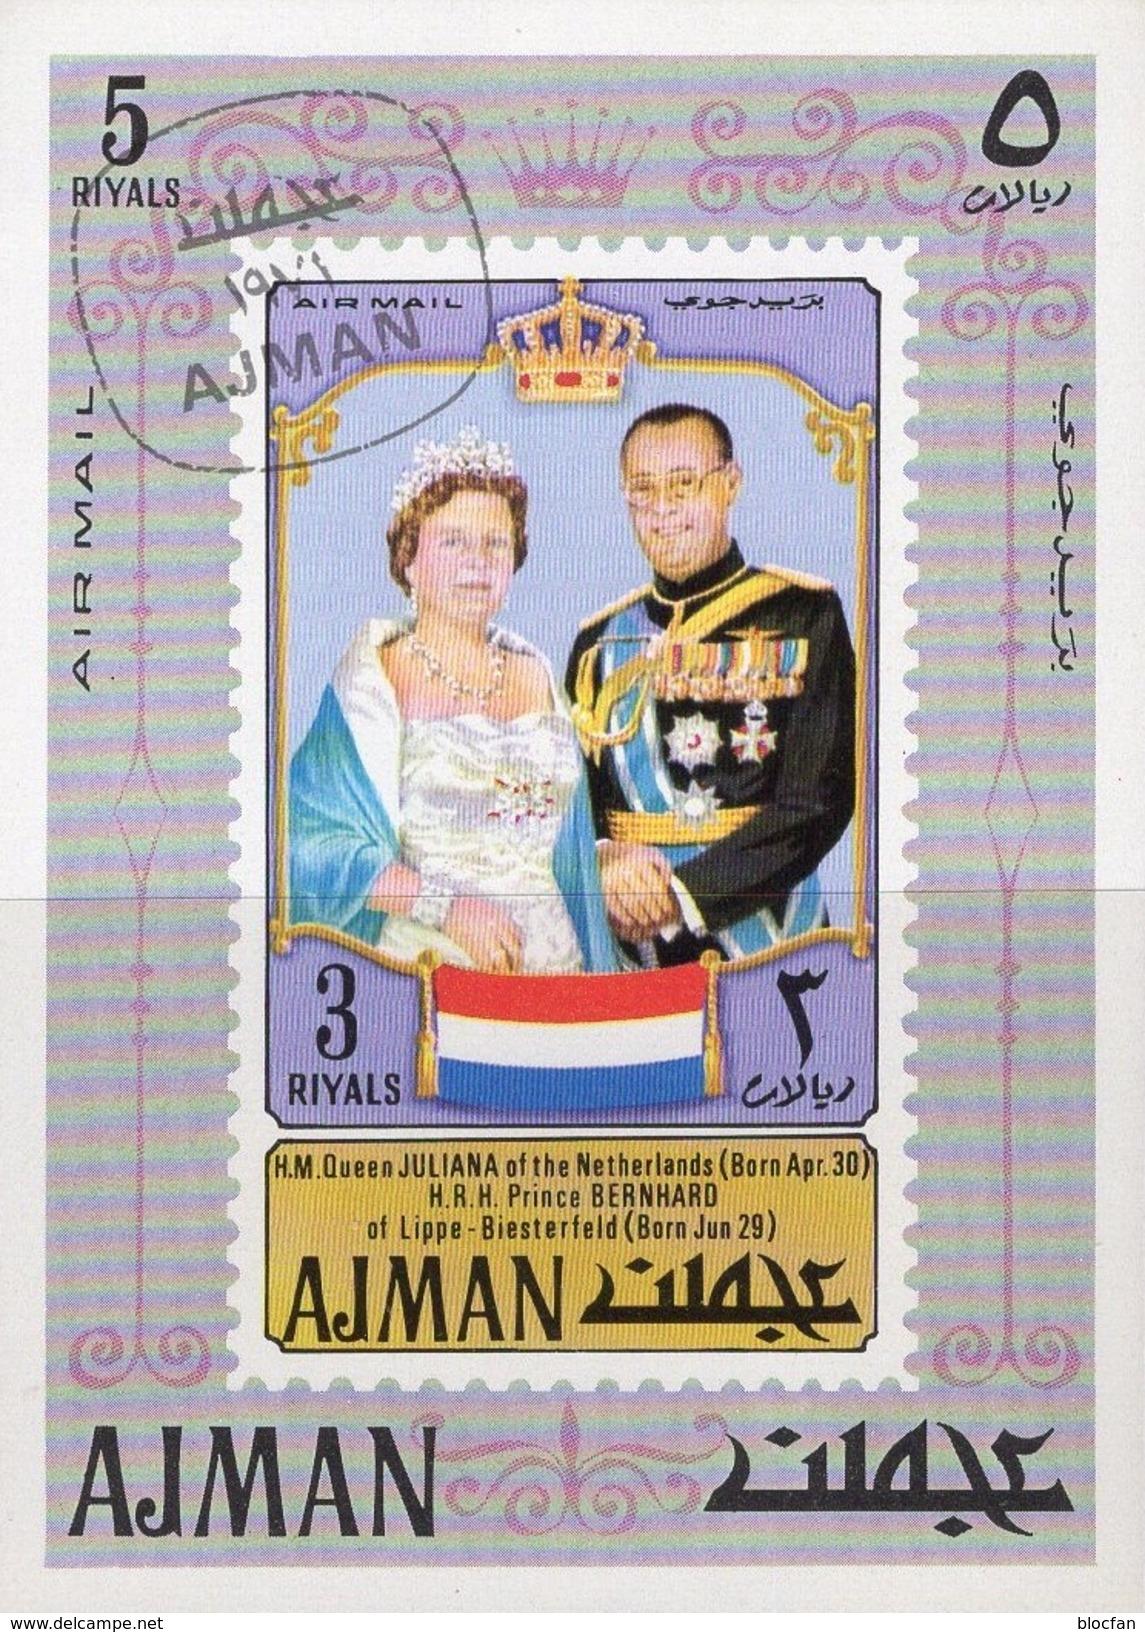 Prince Bernhardt/ Königin Julianet NL 1971 Adschman Block 316 O 6€ Niederlande Royal Bloc S/s Queen Sheet M/s Bf VA - Royalties, Royals